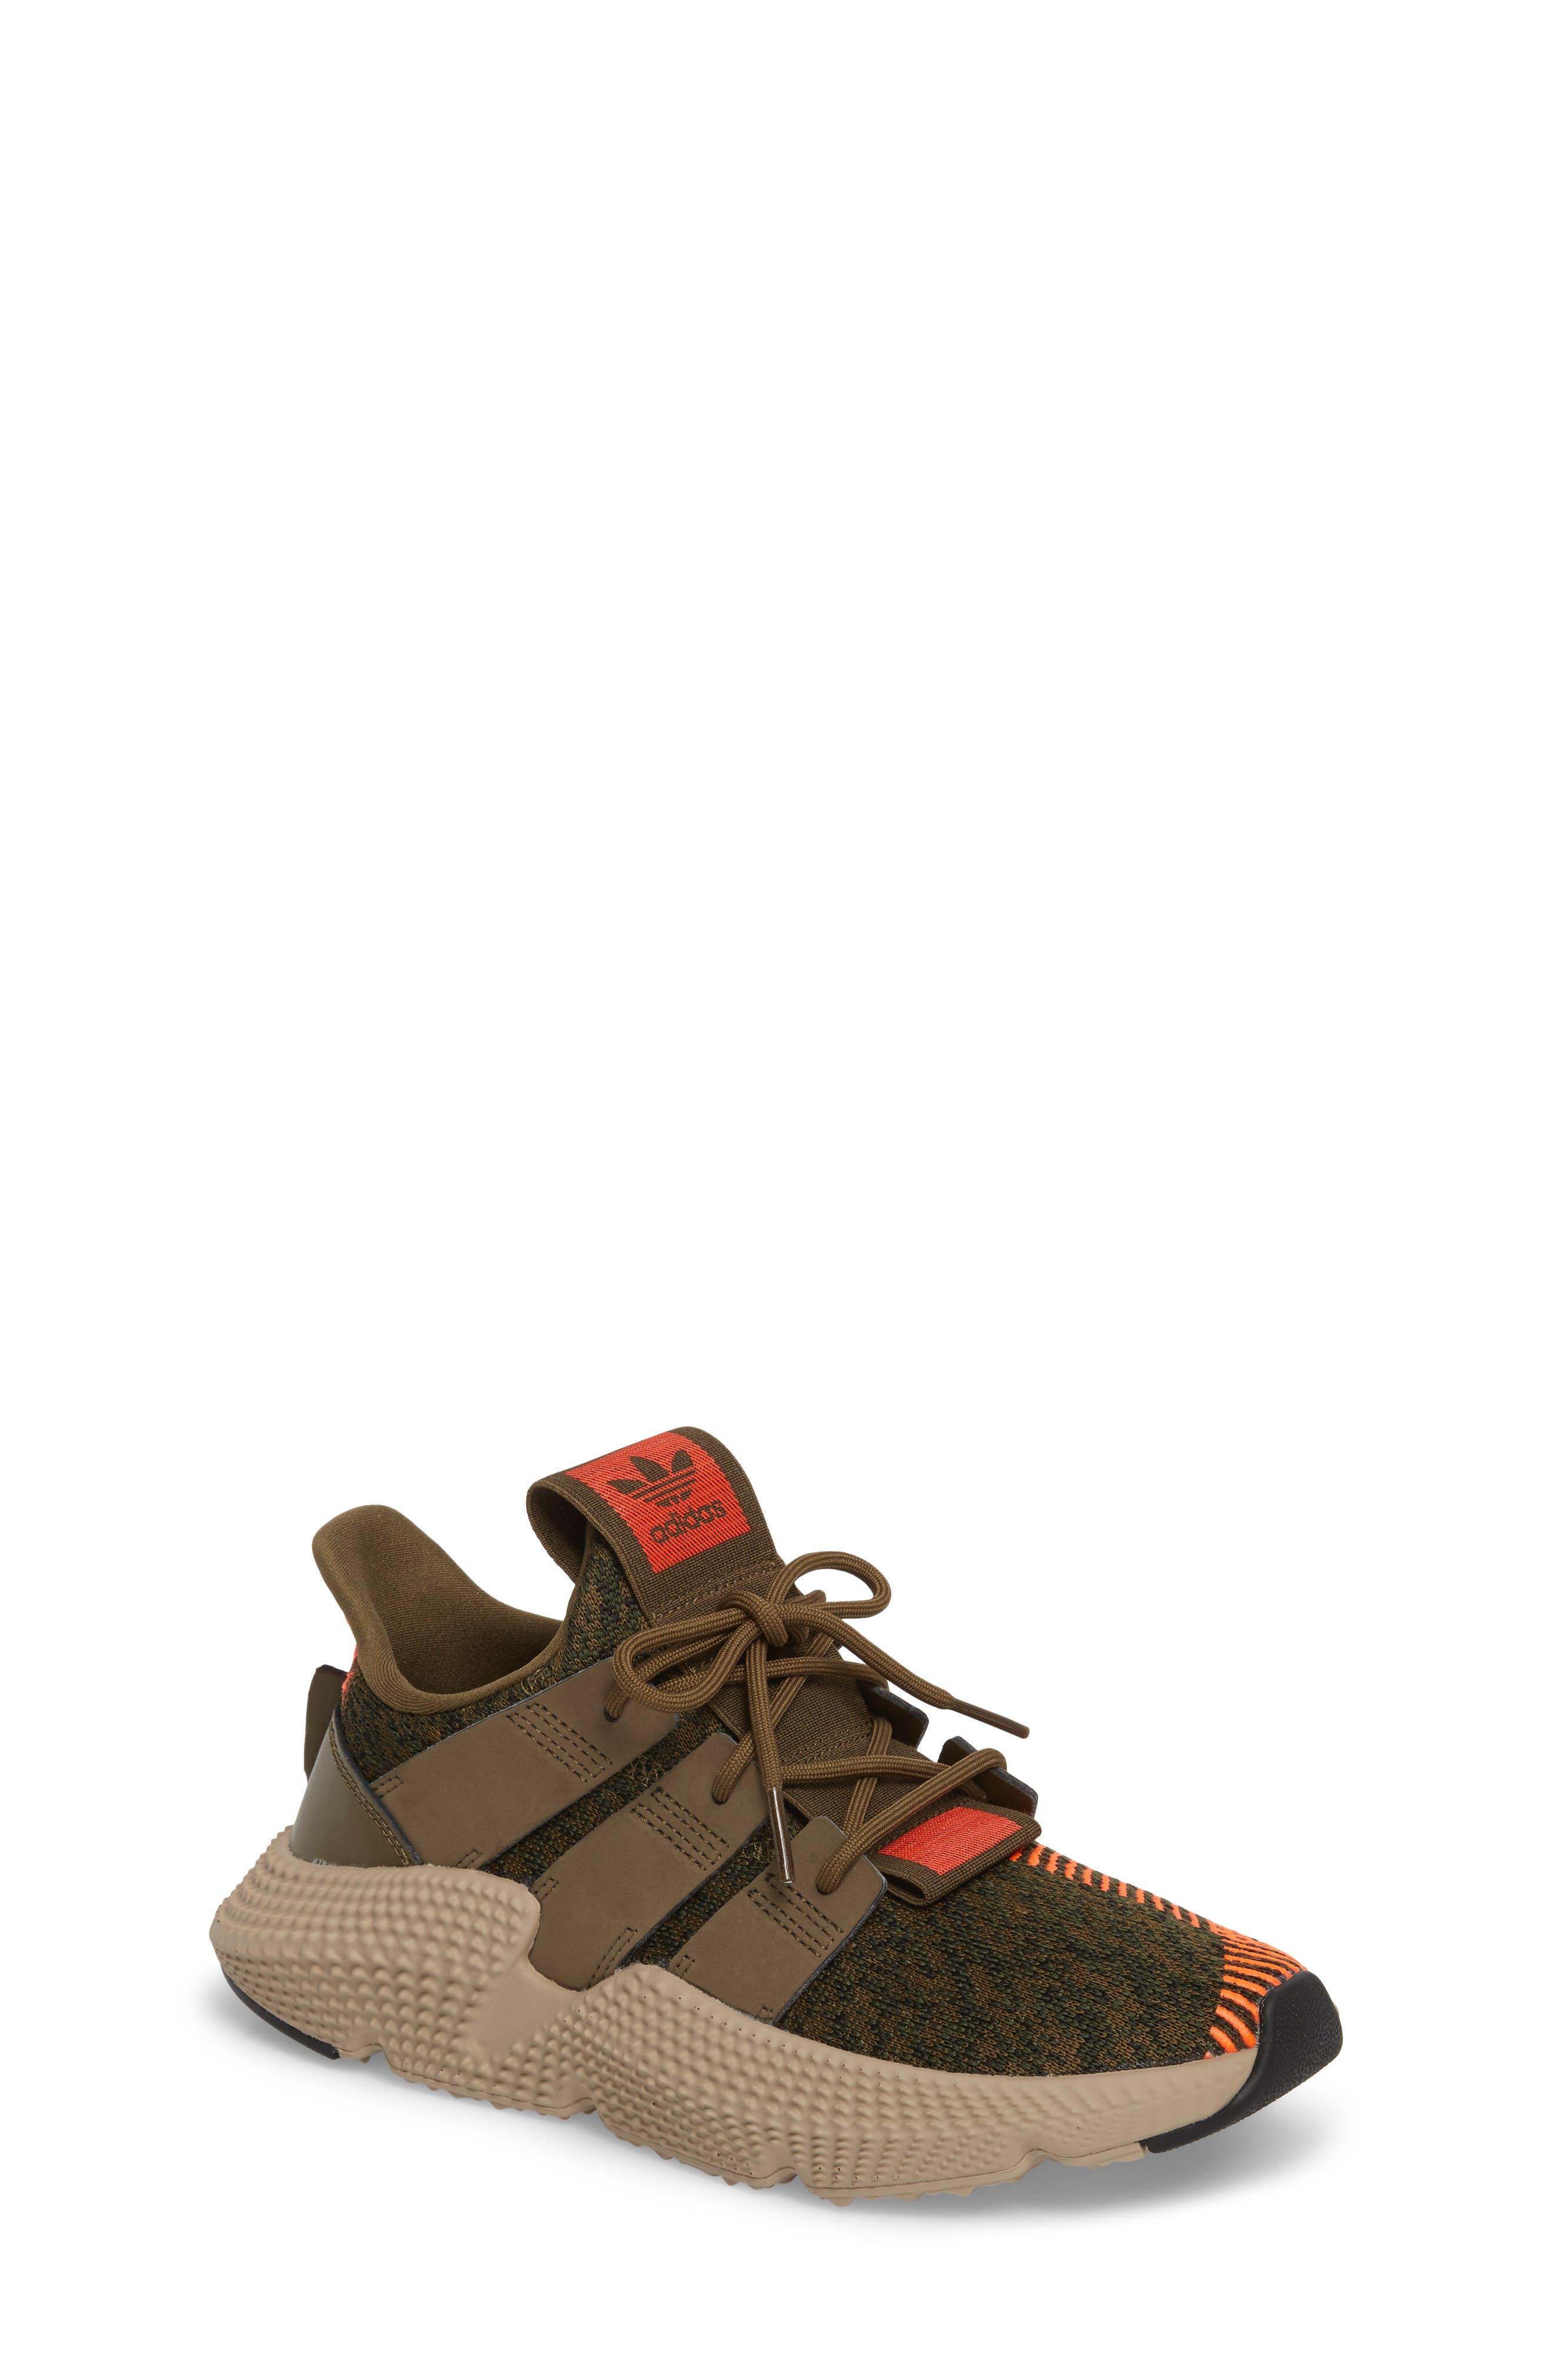 Prophere Sneaker,                             Main thumbnail 1, color,                             Trace Olive / Trace Khaki